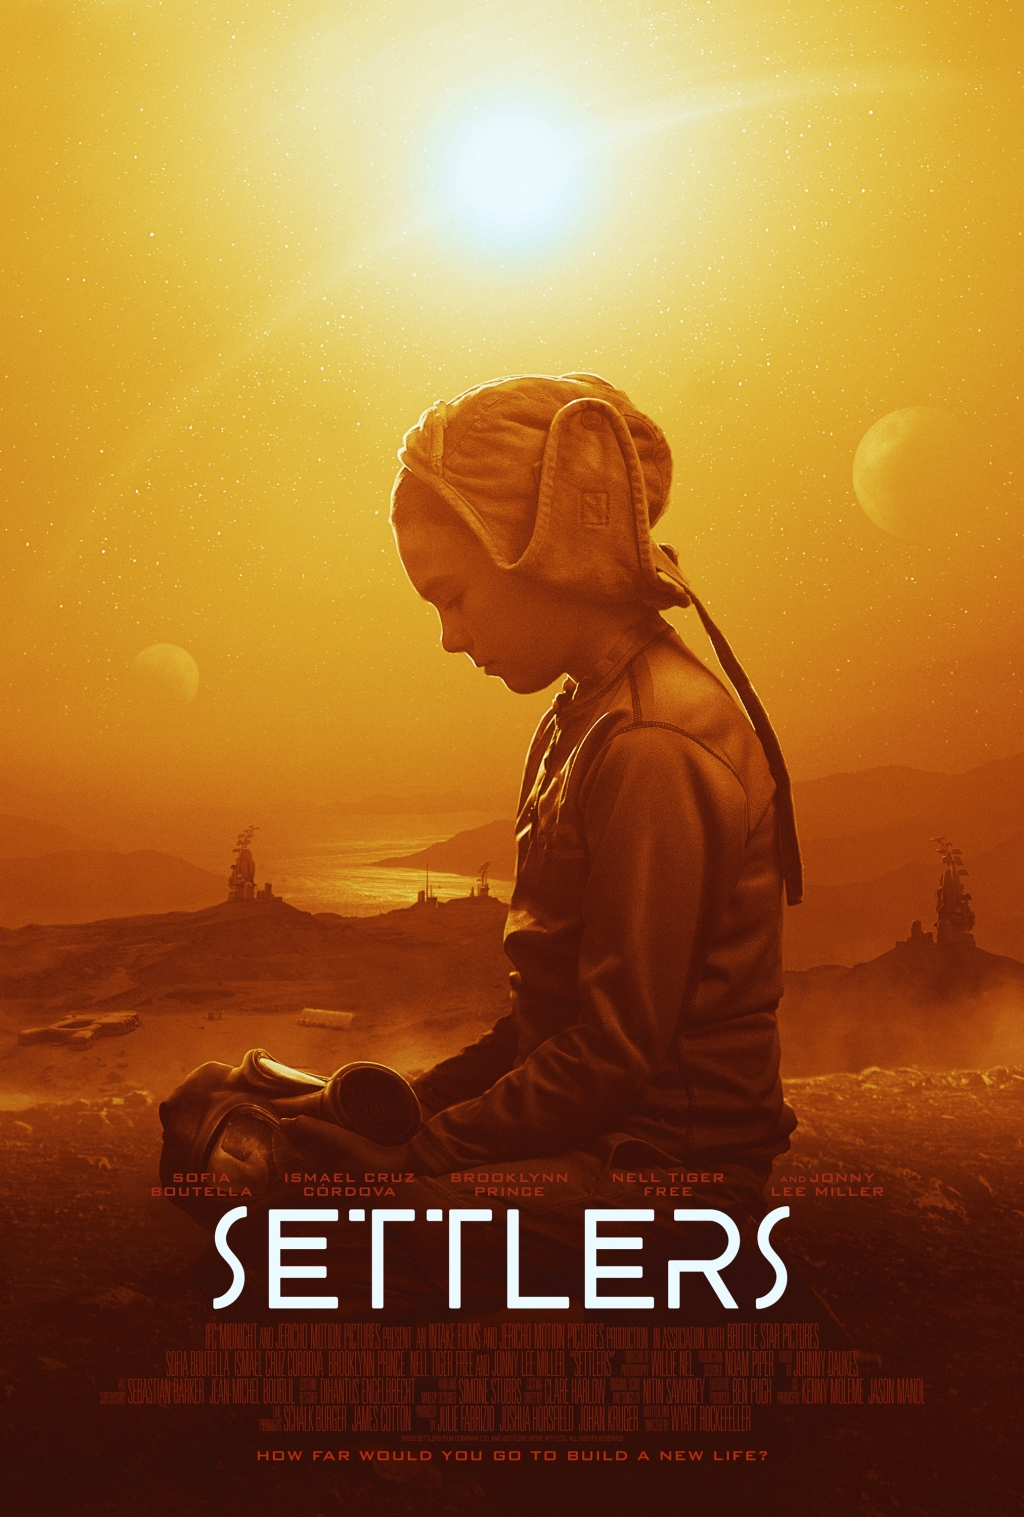 'Settlers' poster